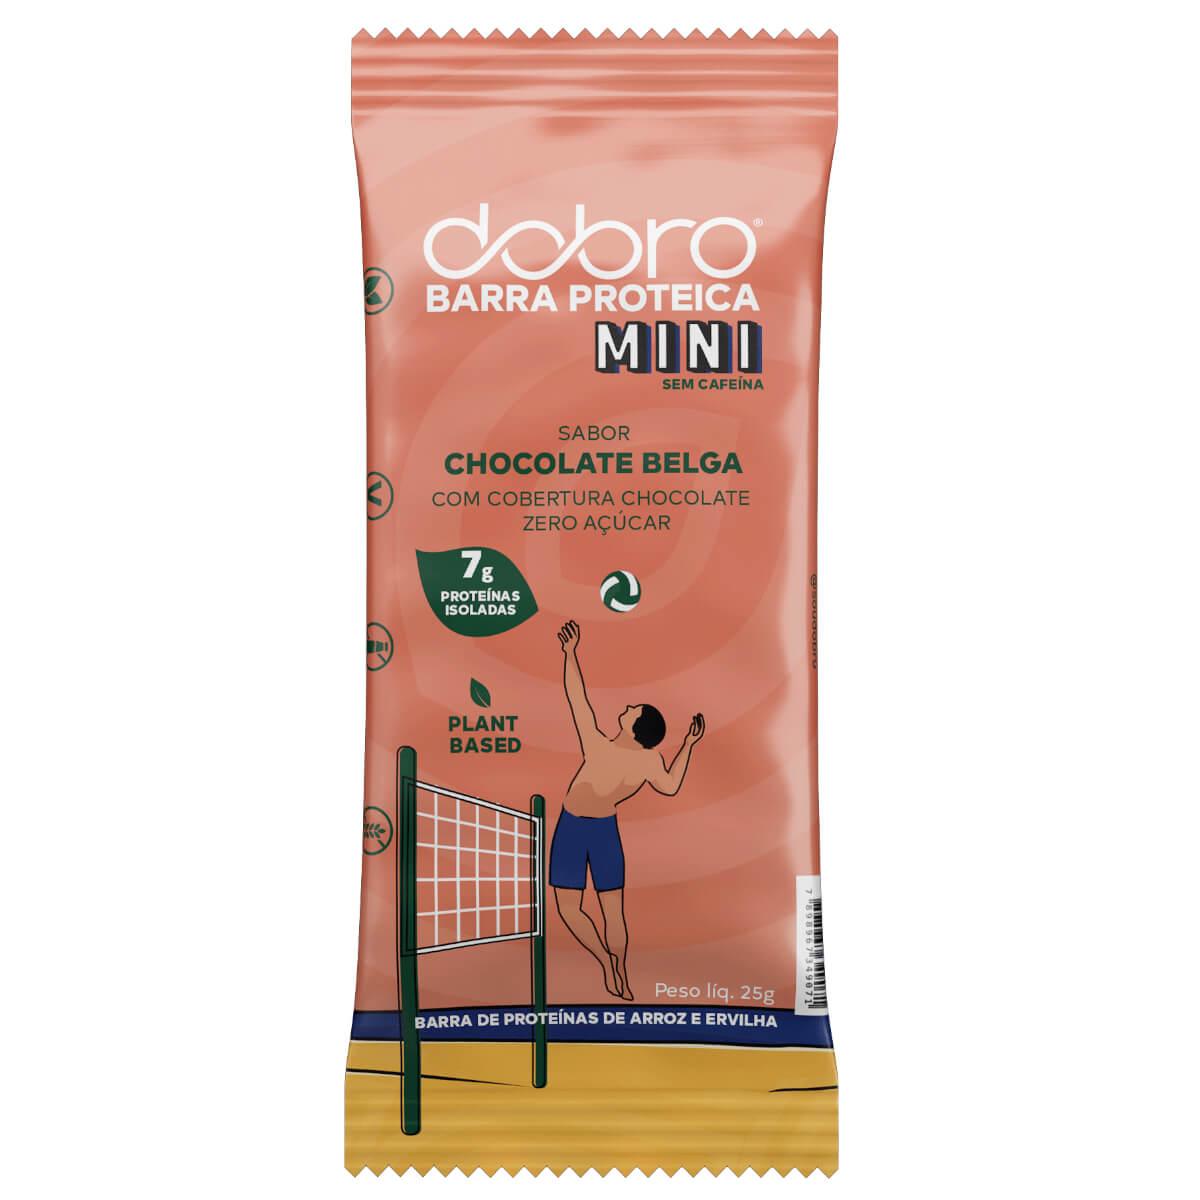 Barra Proteica Vegana Dobro Mini Chocolate Belga 25g